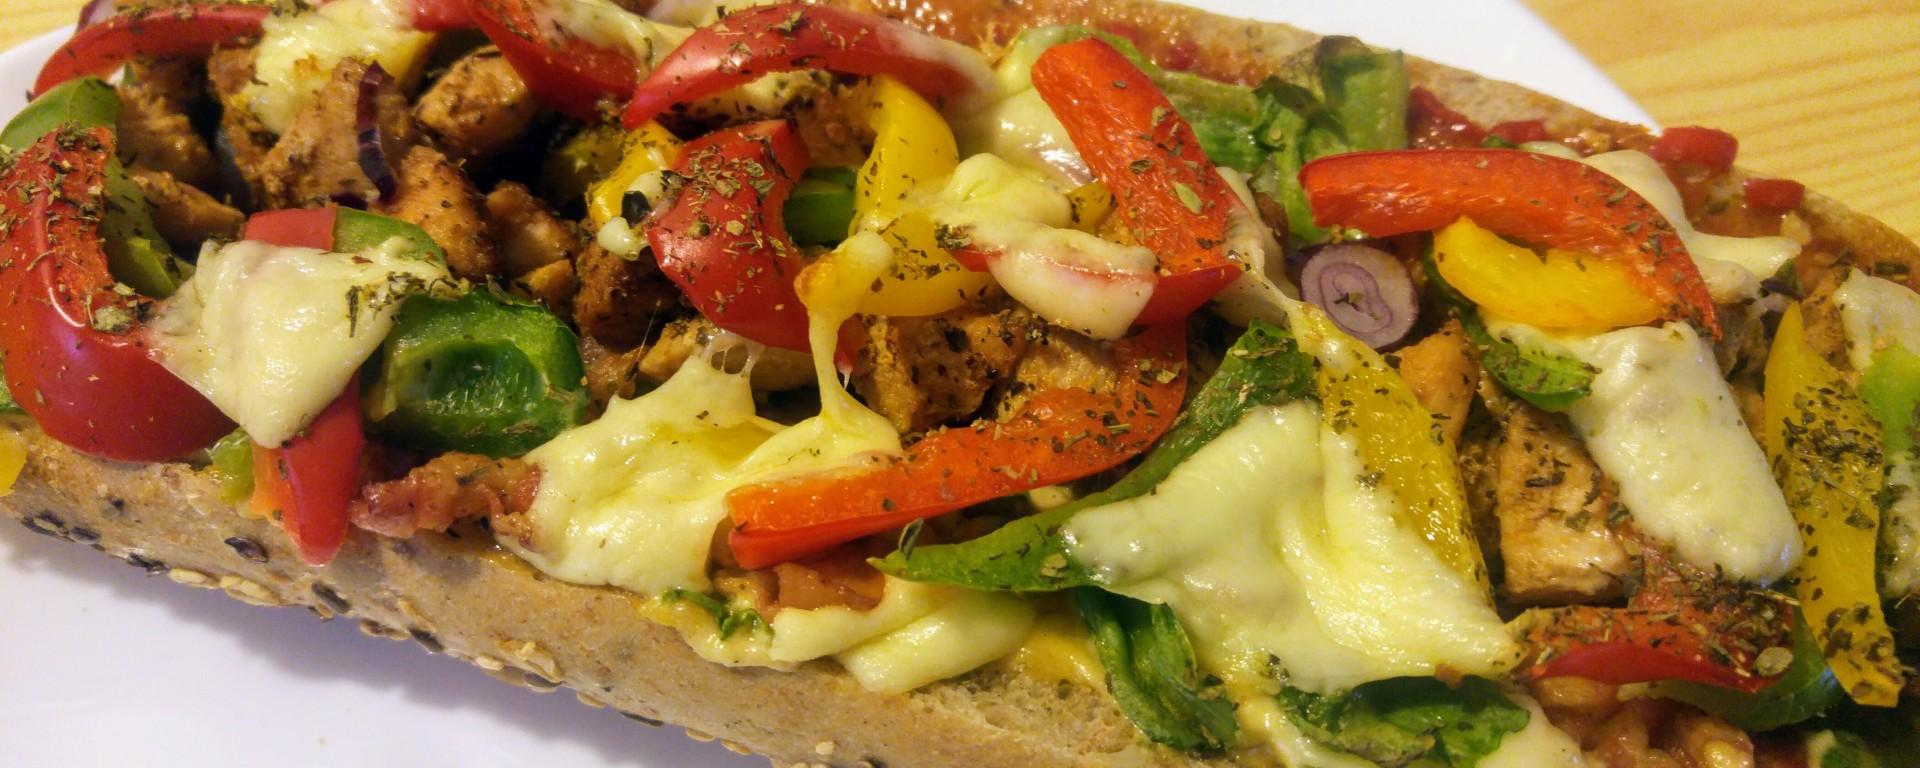 Zapiekanki - oven baked baguette on a plate